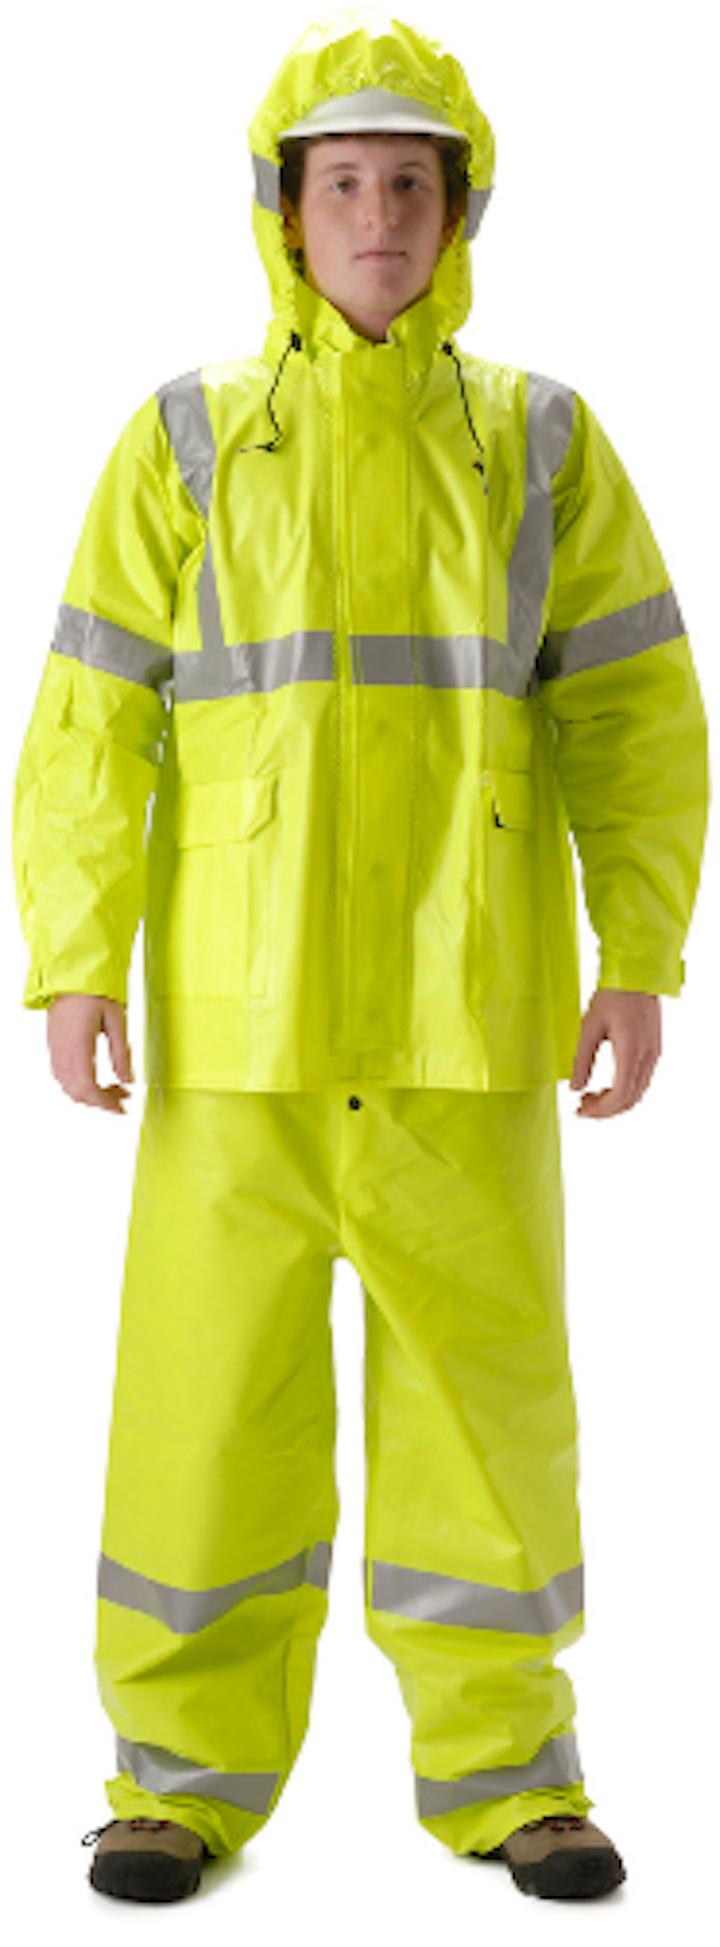 Content Dam Up En Articles 2015 03 Arc Flash Clothing Arc And Flame Resistant Rain Wear Leftcolumn Article Thumbnailimage File